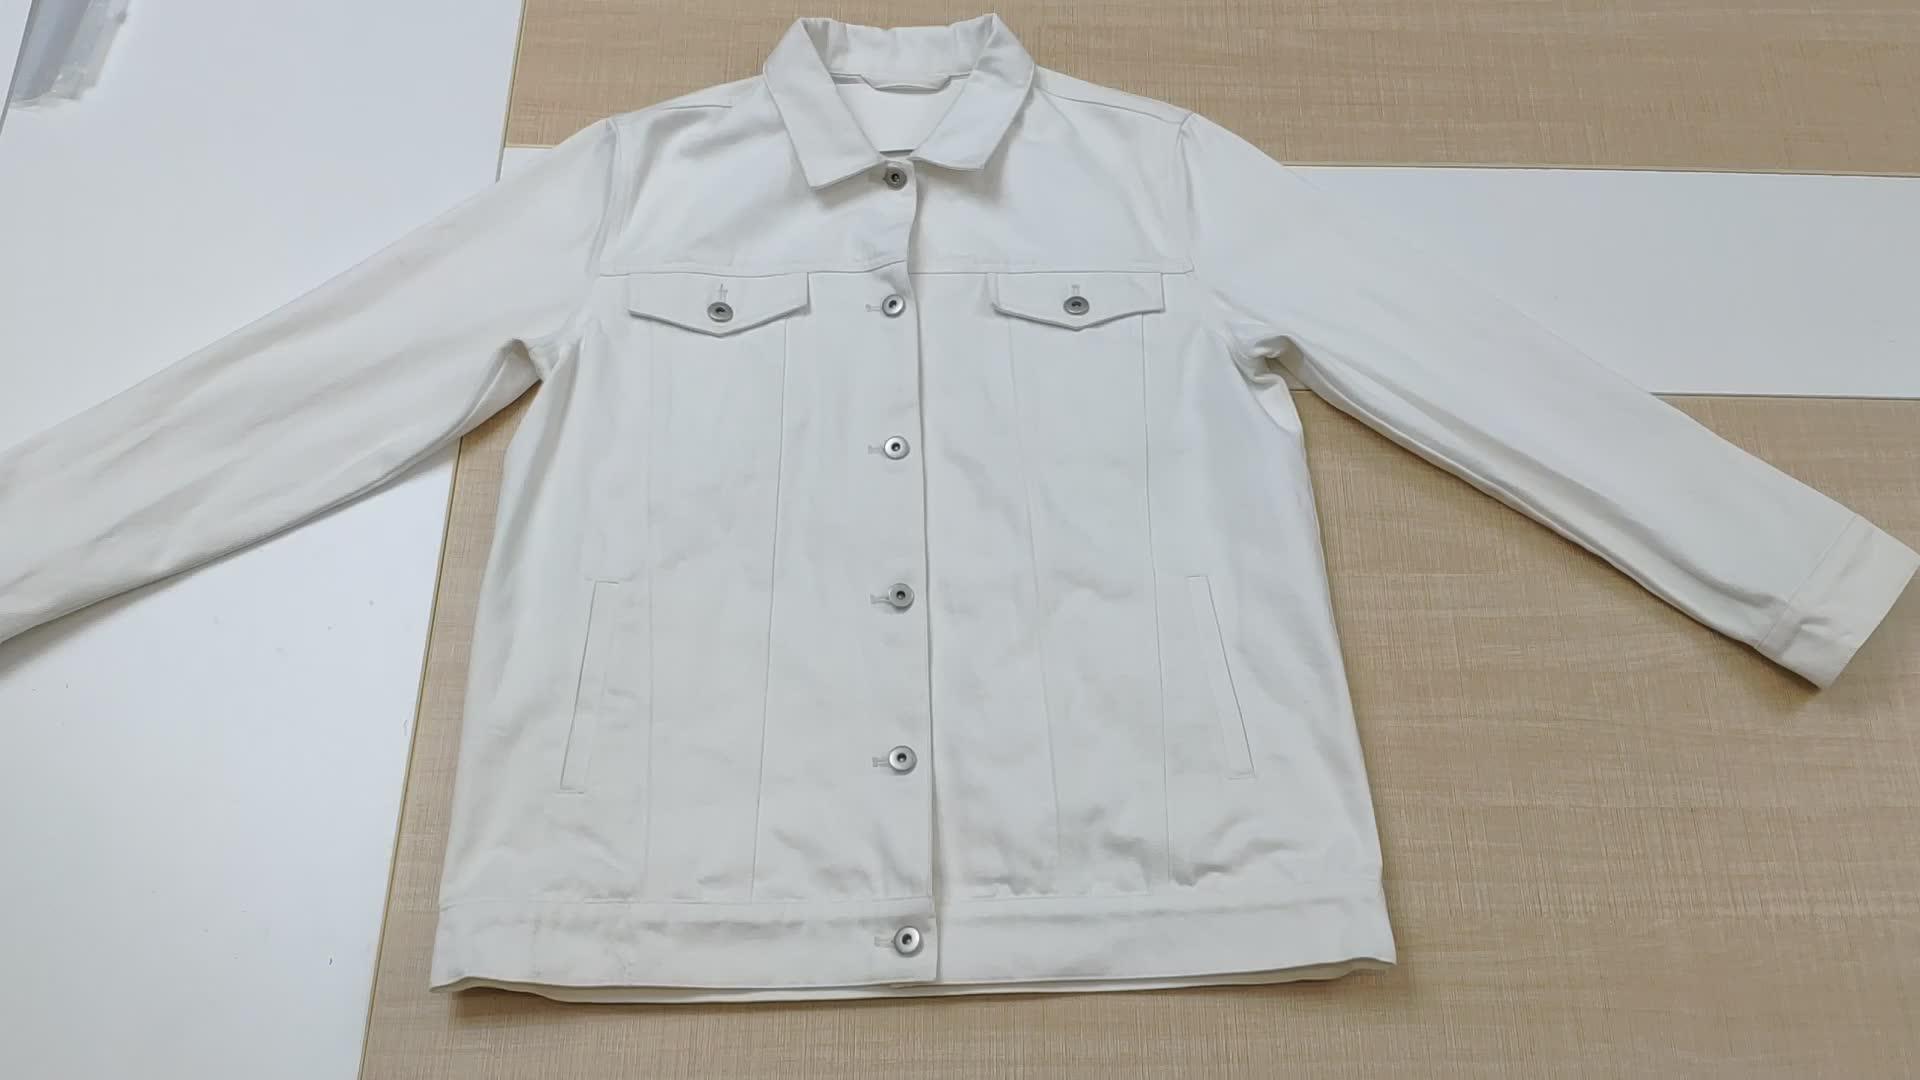 2020 OEM 卸売ブランクバーシティジャケット黒のデニムジャケット